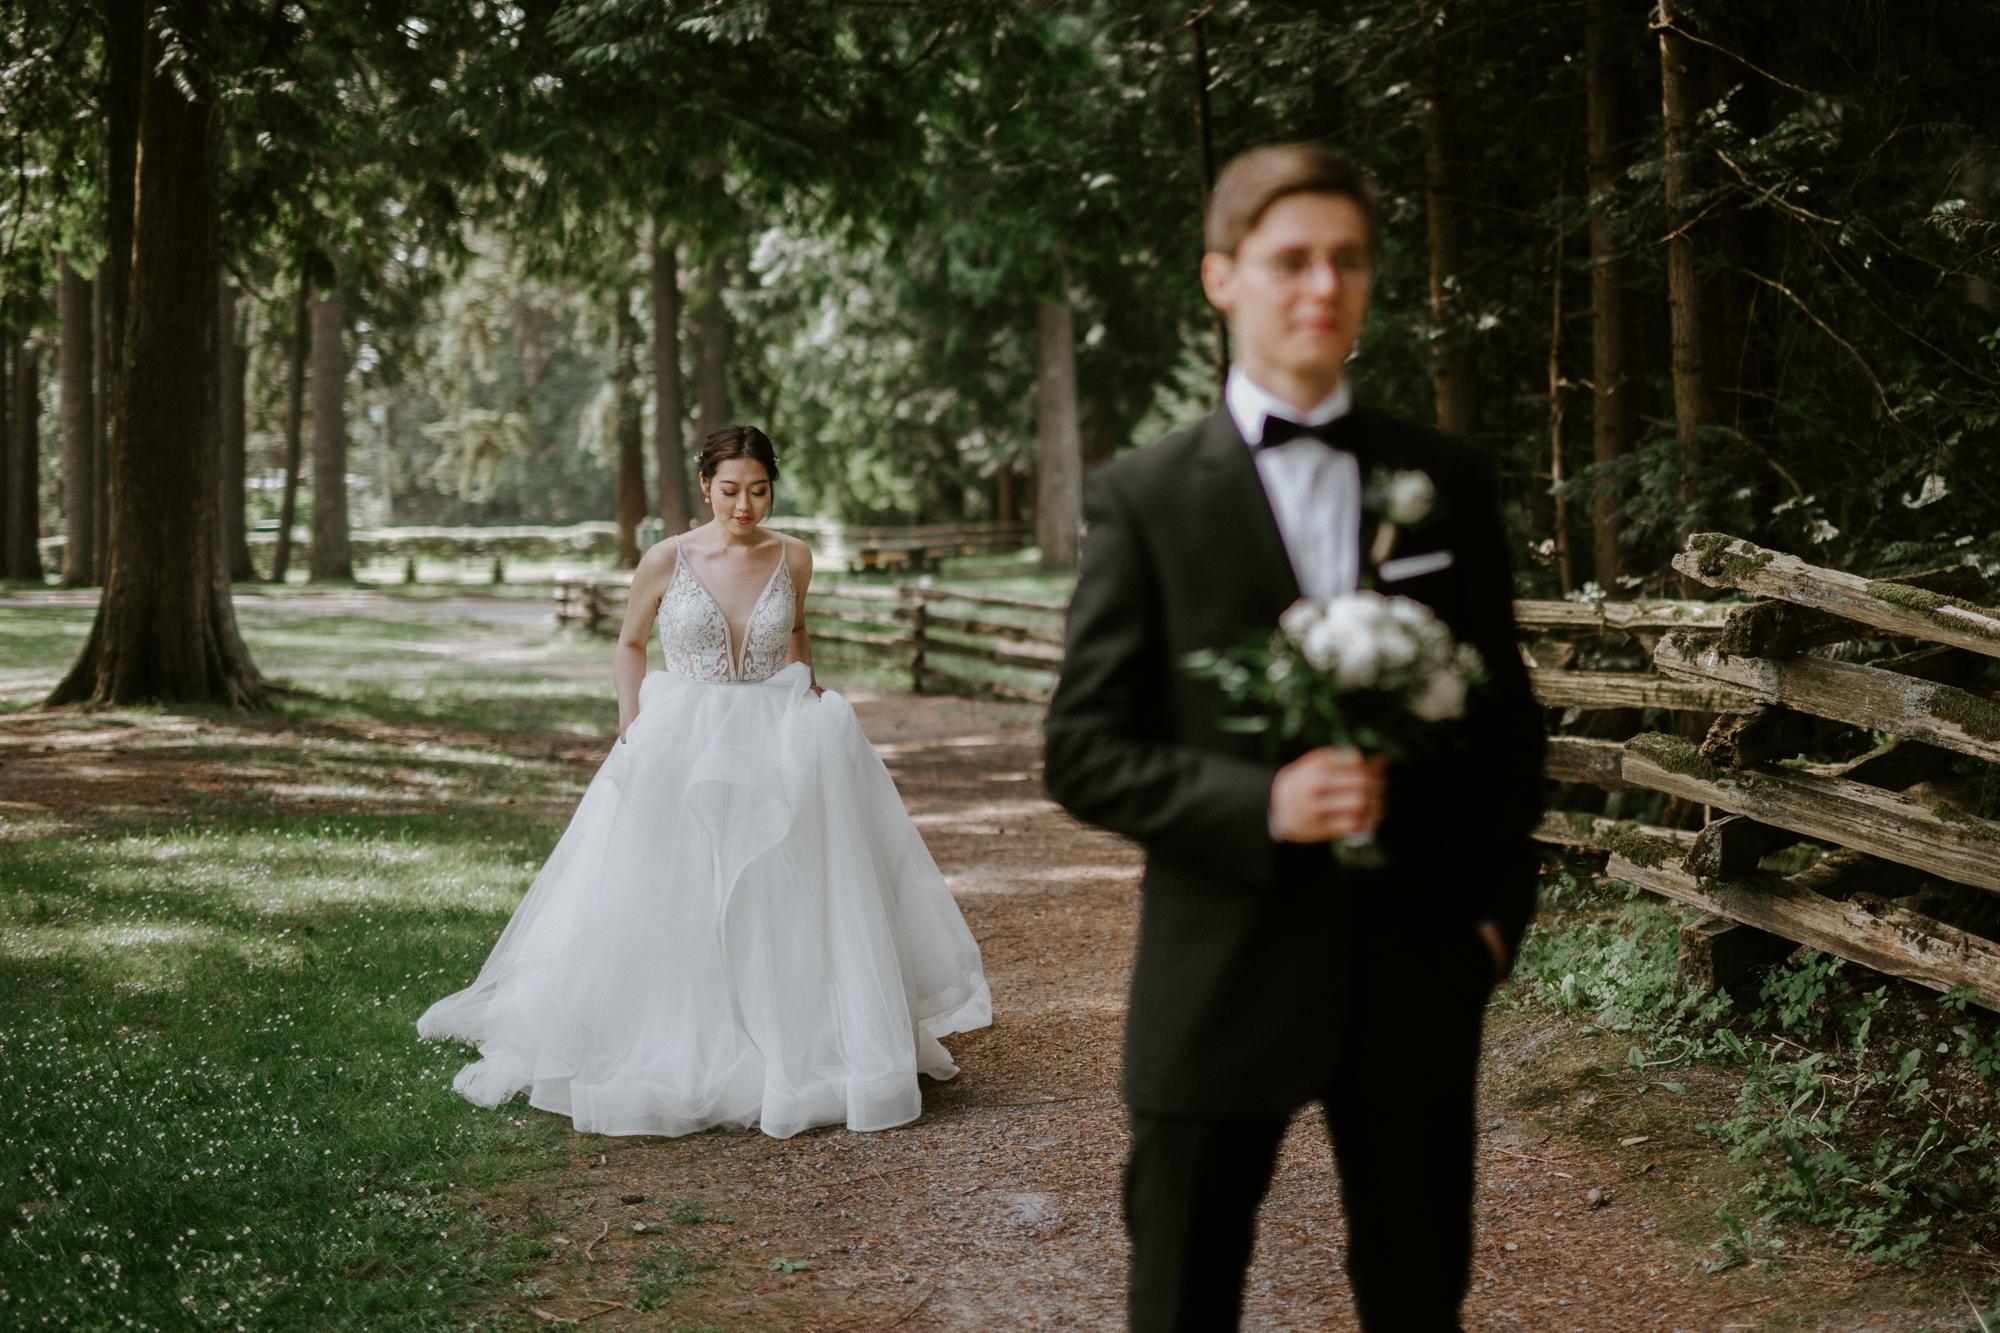 Yelim& Sorin- Wedding Day- HL-SD-50.JPG